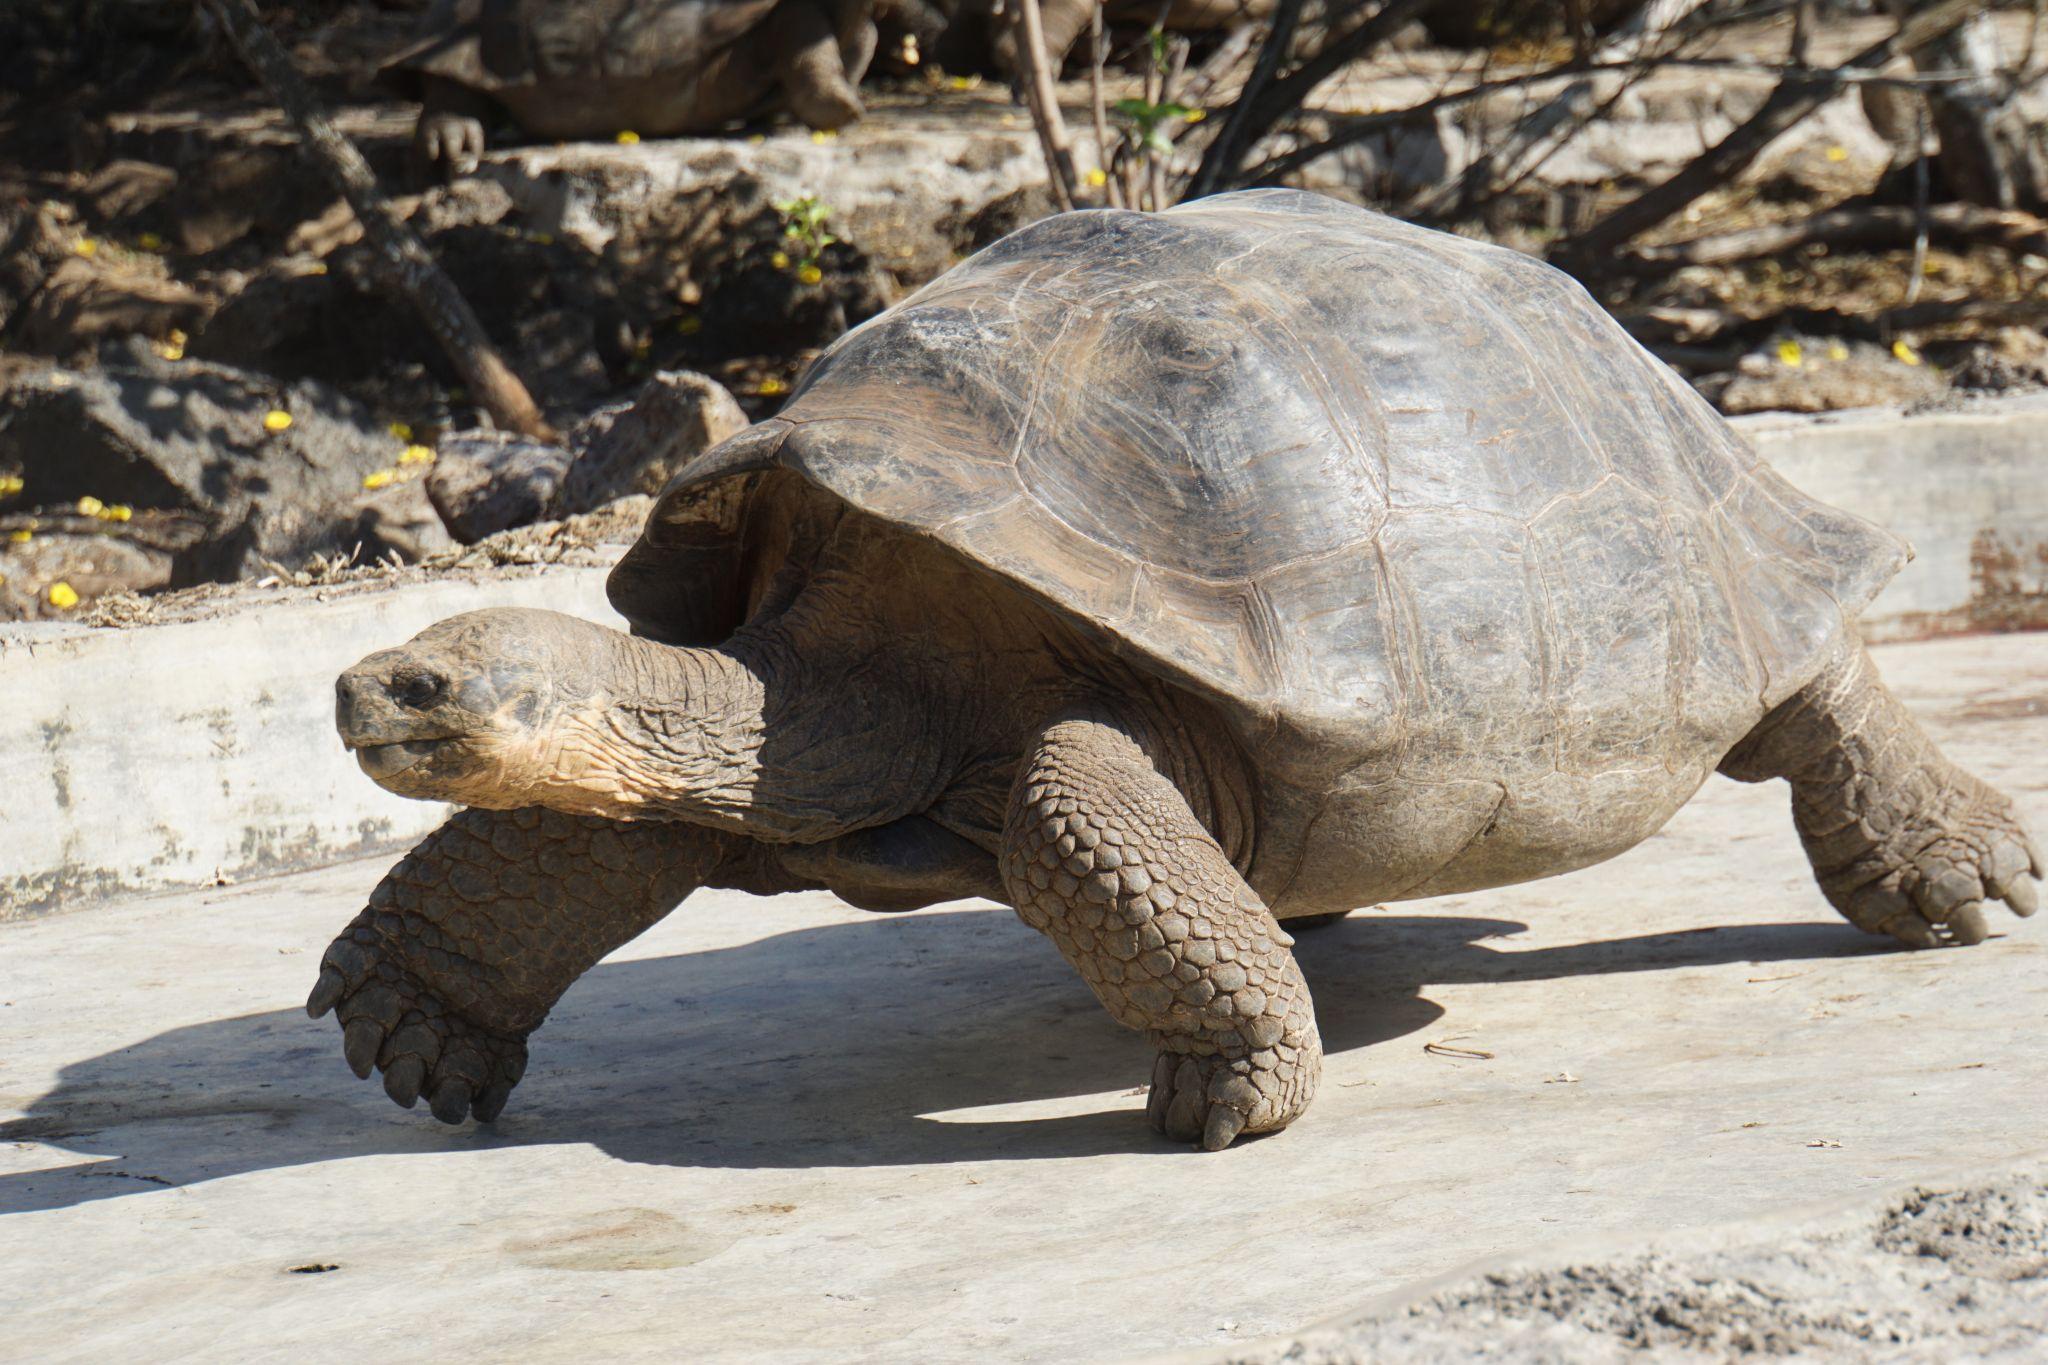 Giant Galápagos tortoise on Santa Cruz